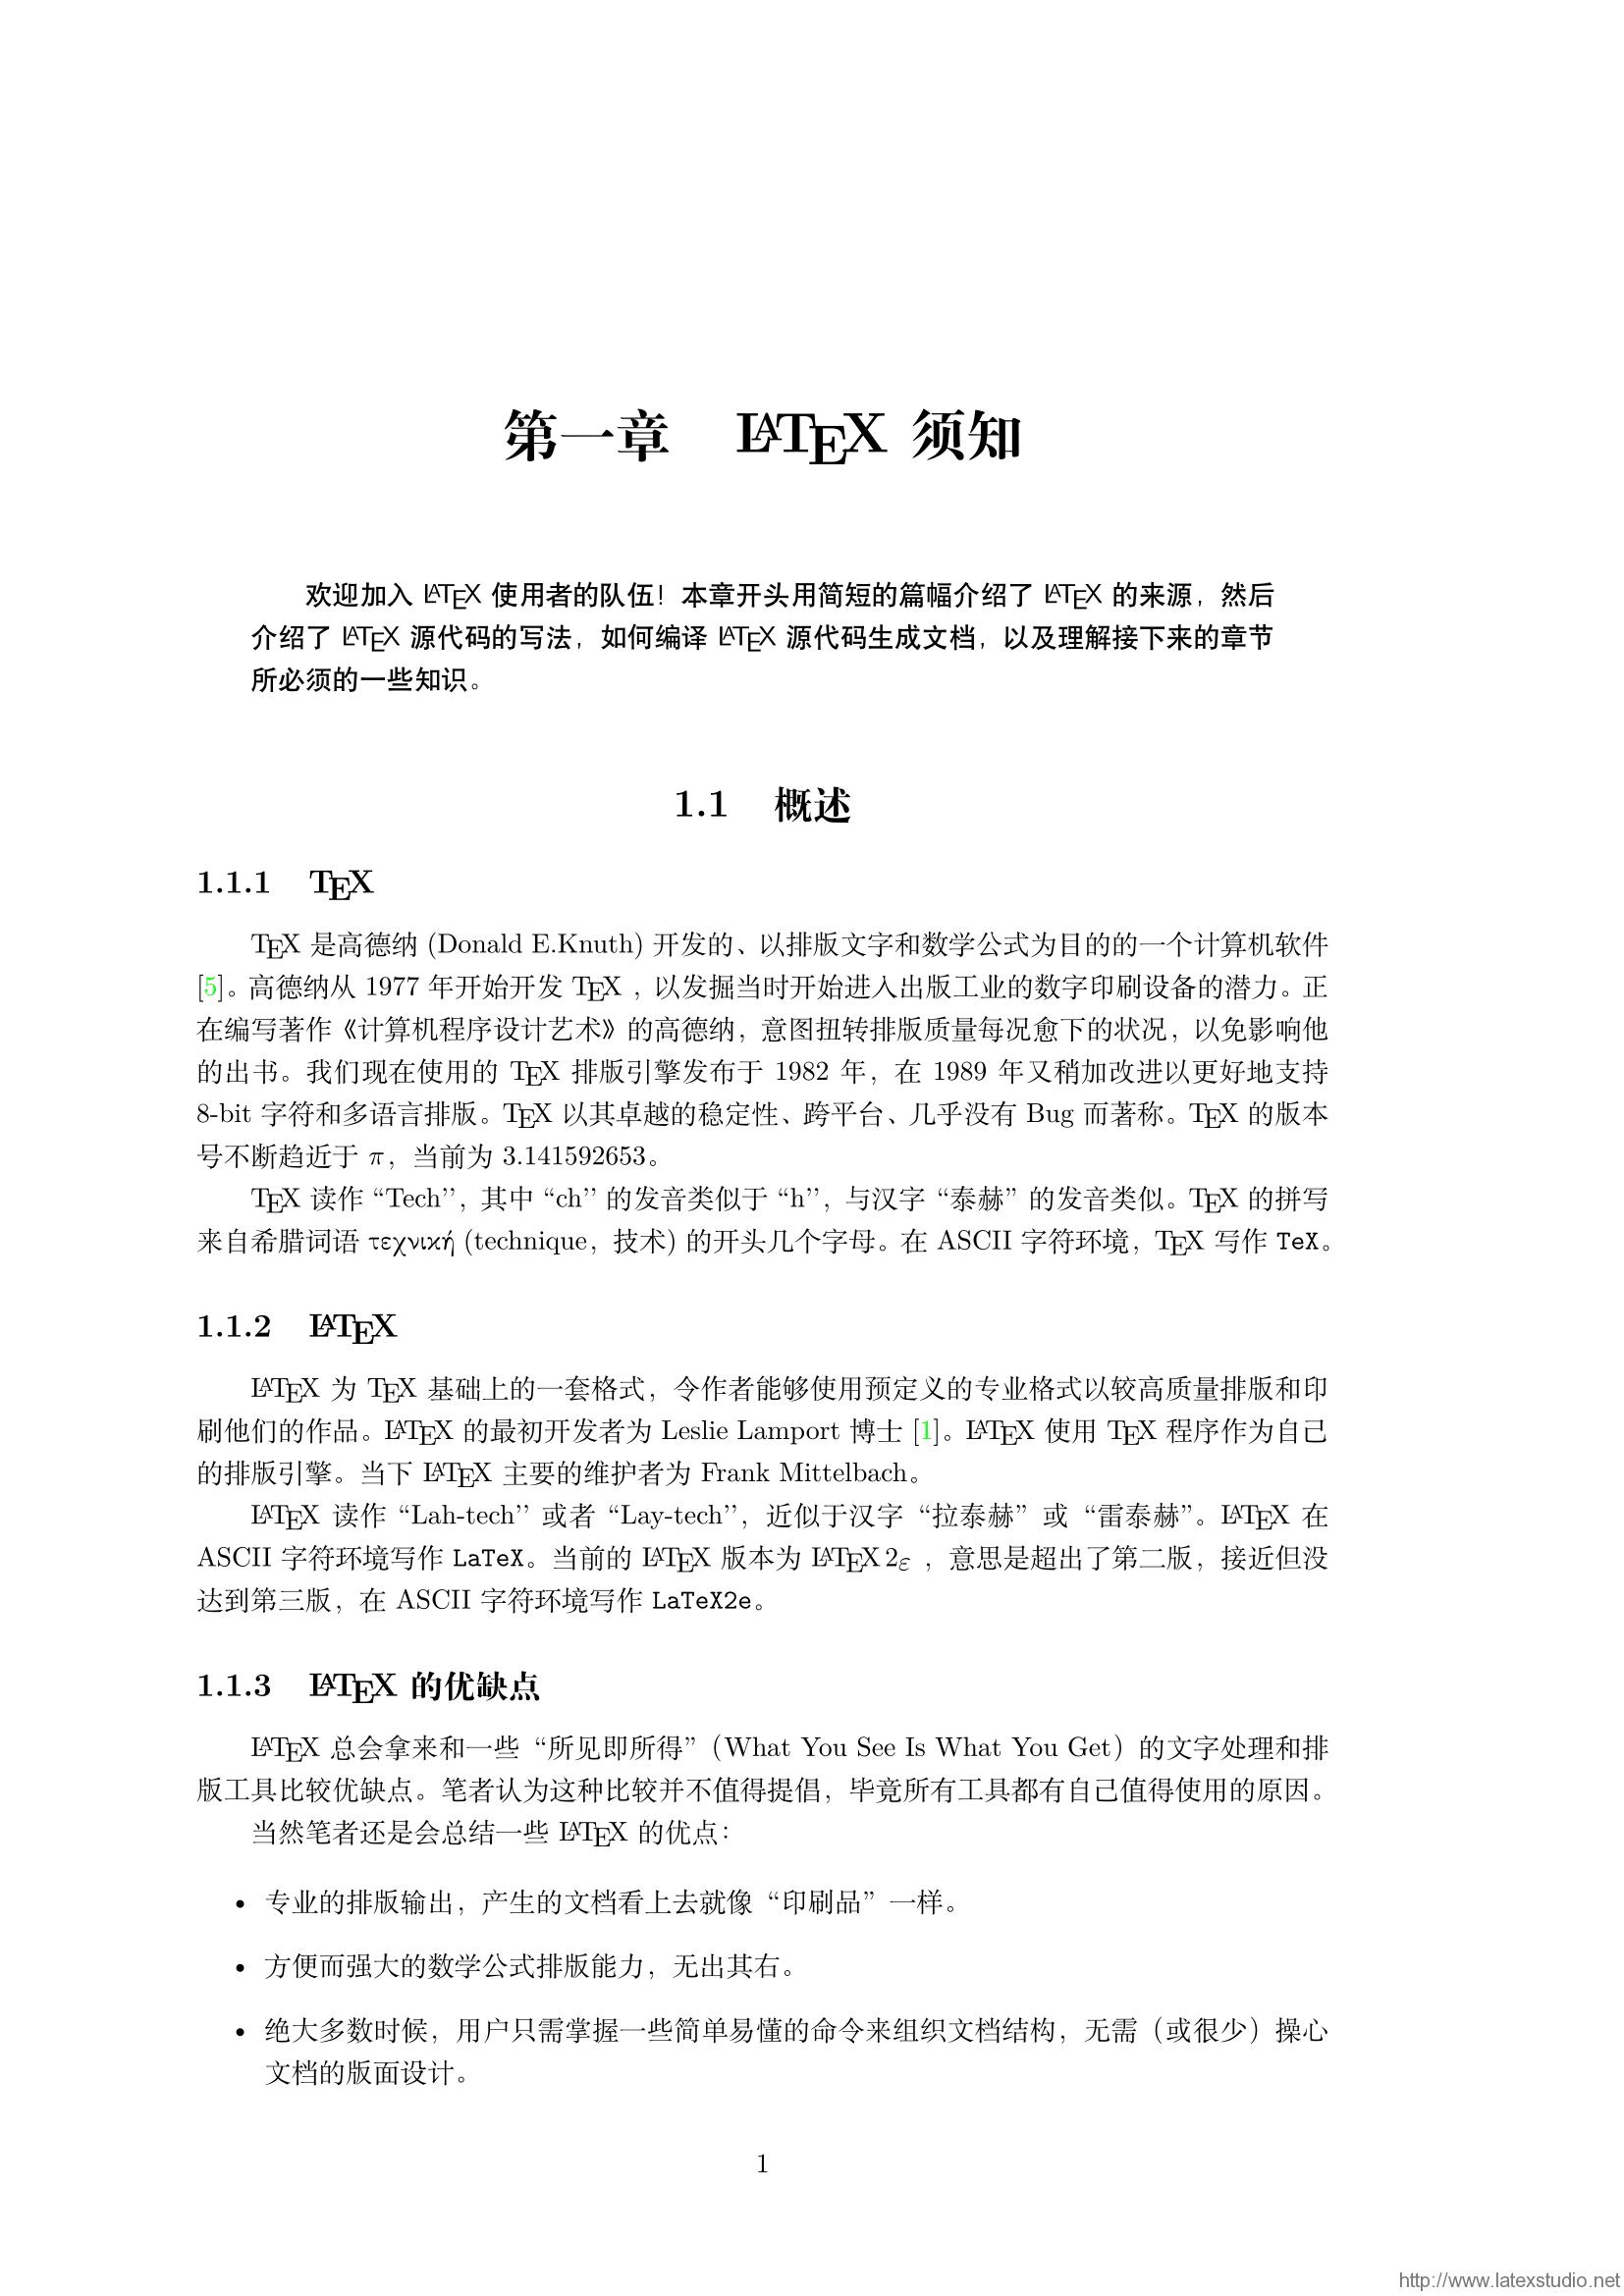 lshort-zh-cn-15